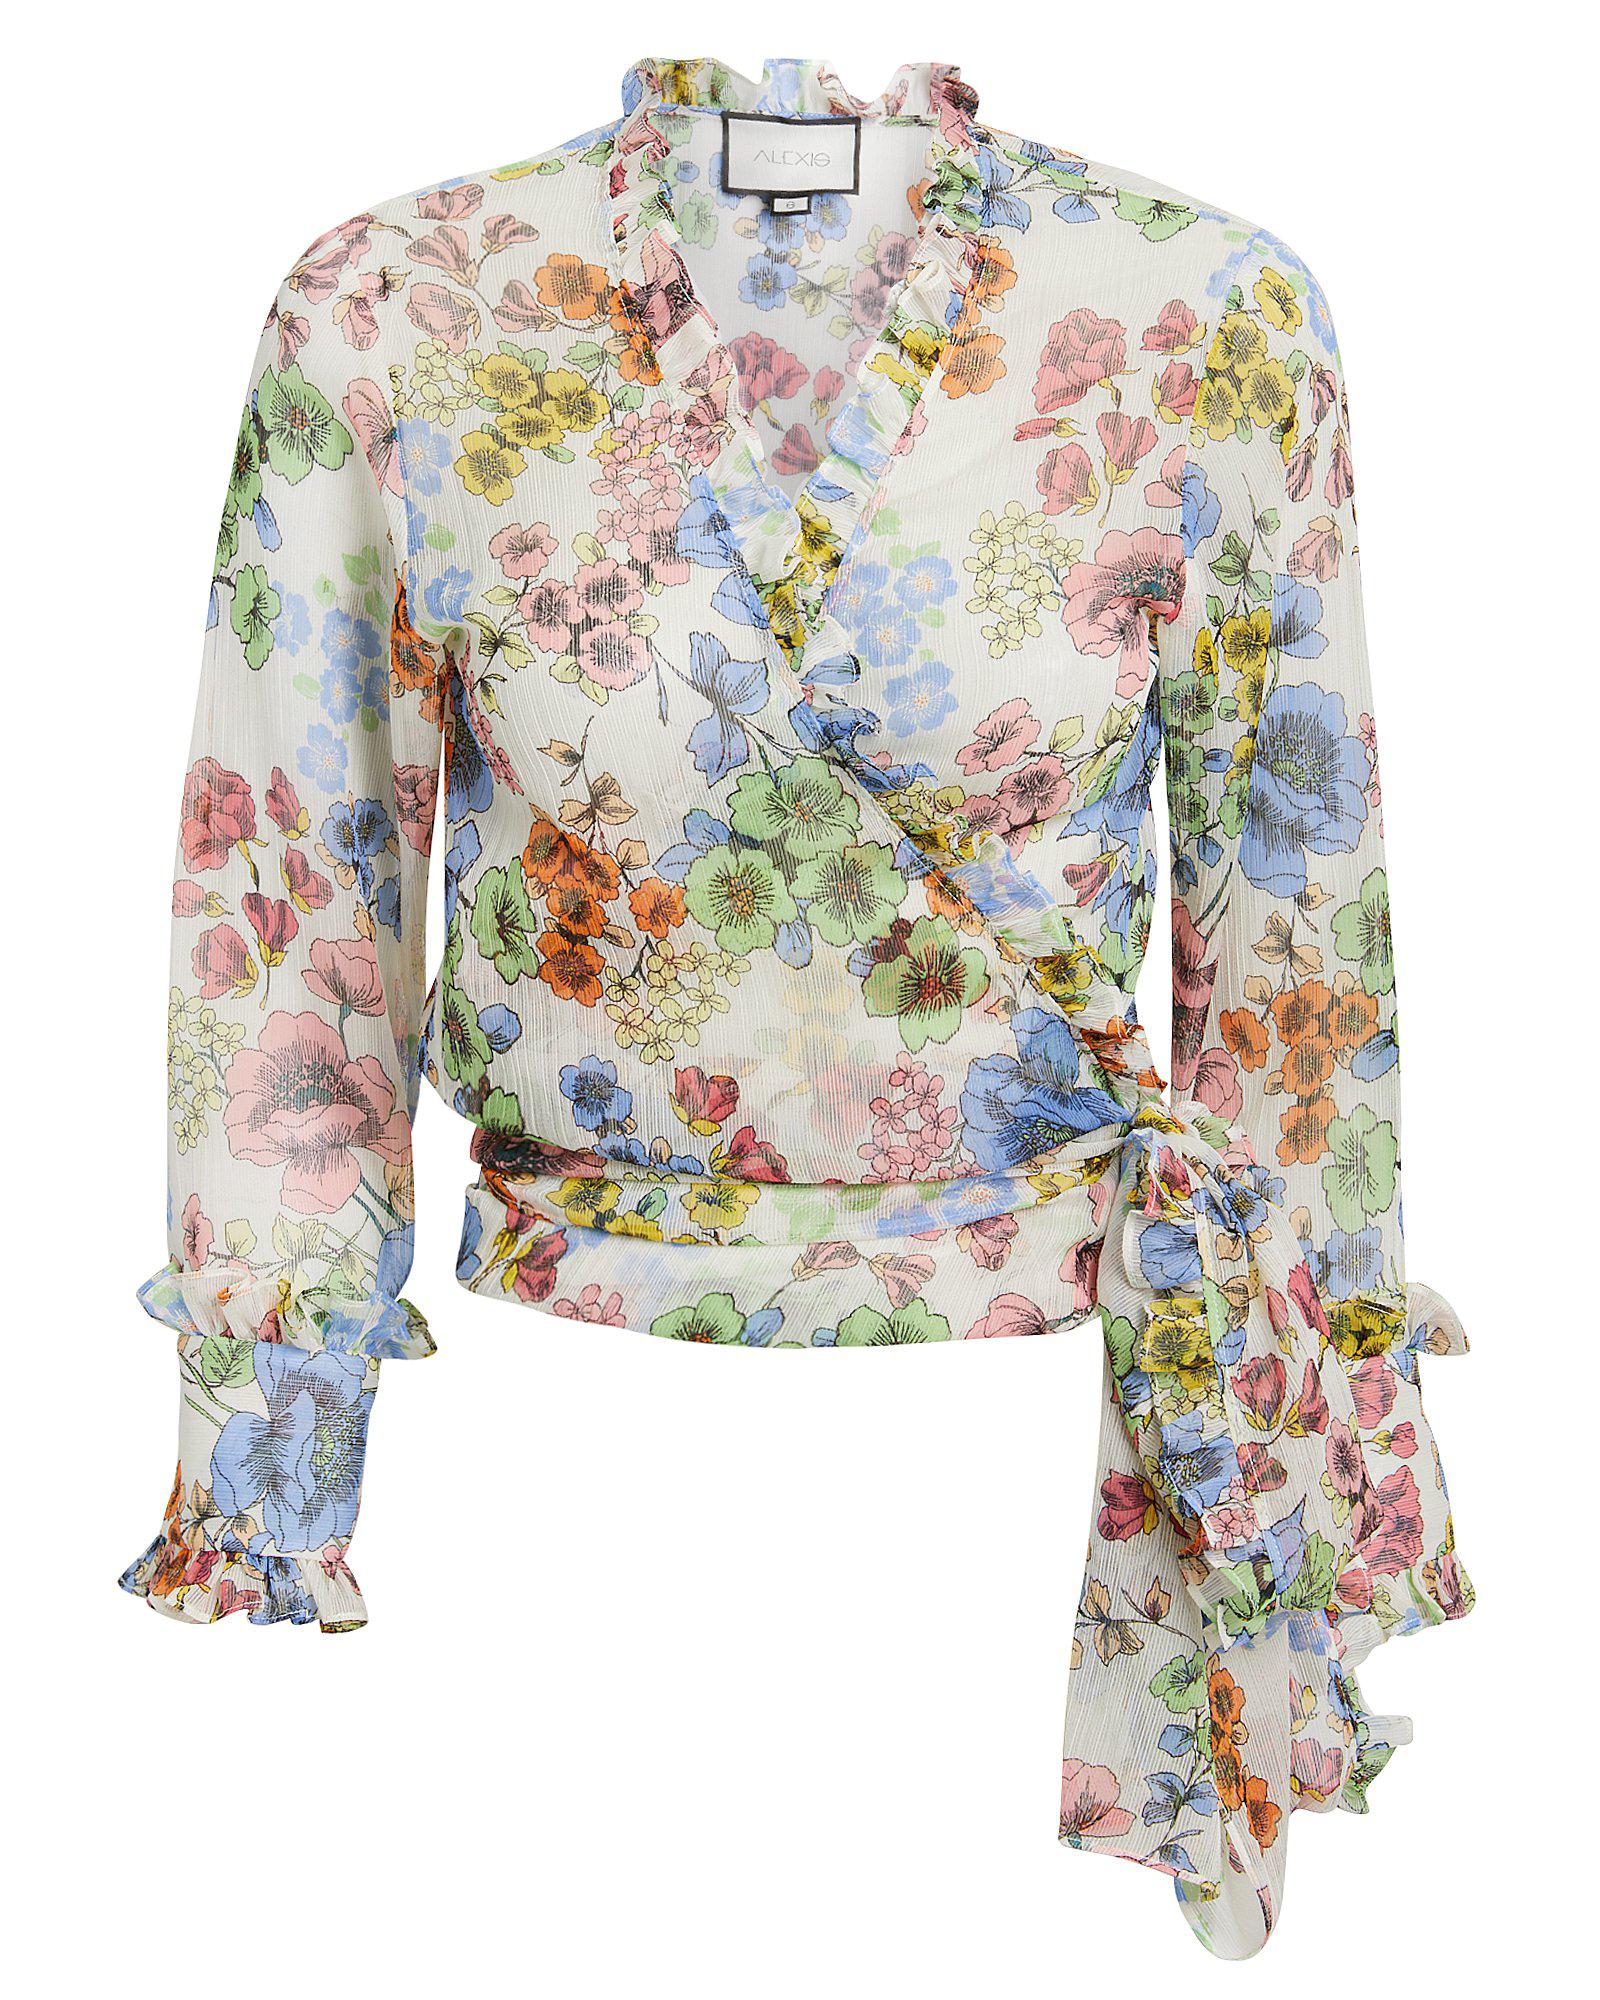 b452da3822504 Alexis Missie Floral Long-Sleeve Wrap Top In Blue